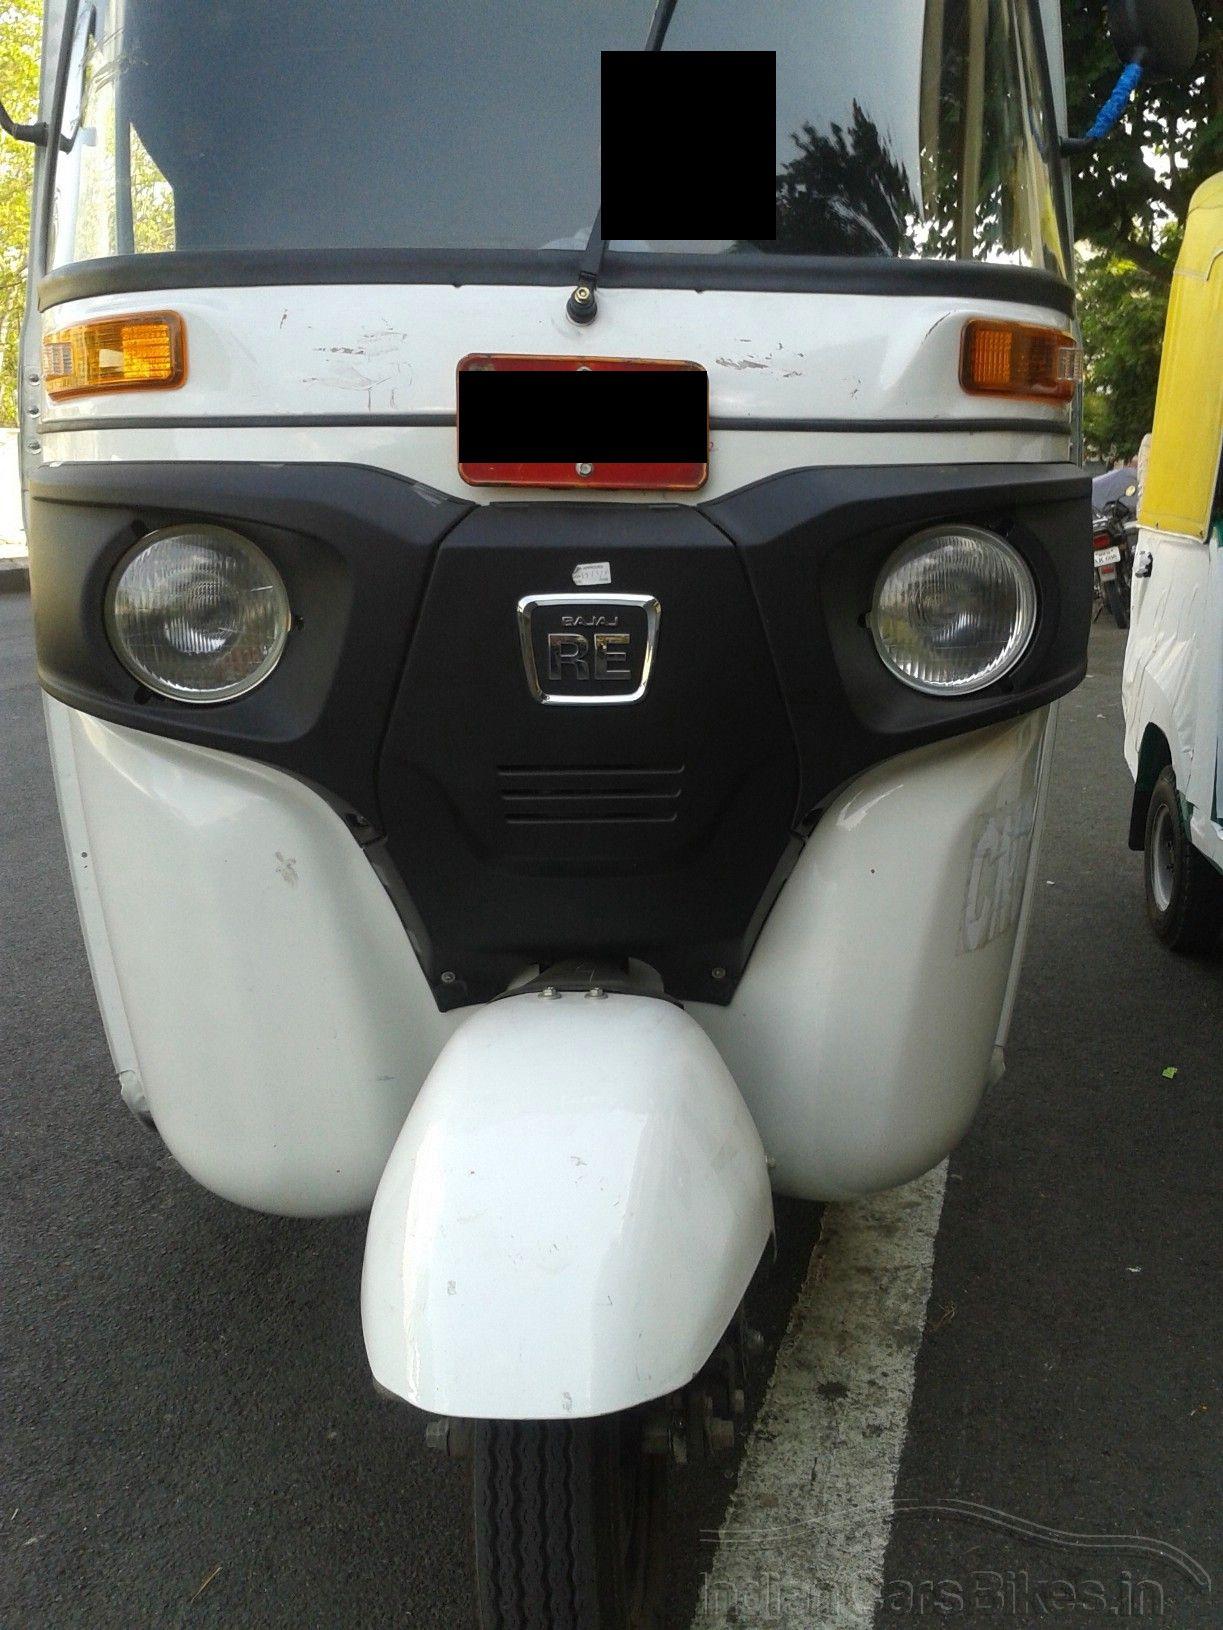 front fascia of the 2013 Bajaj RE three wheeler spied